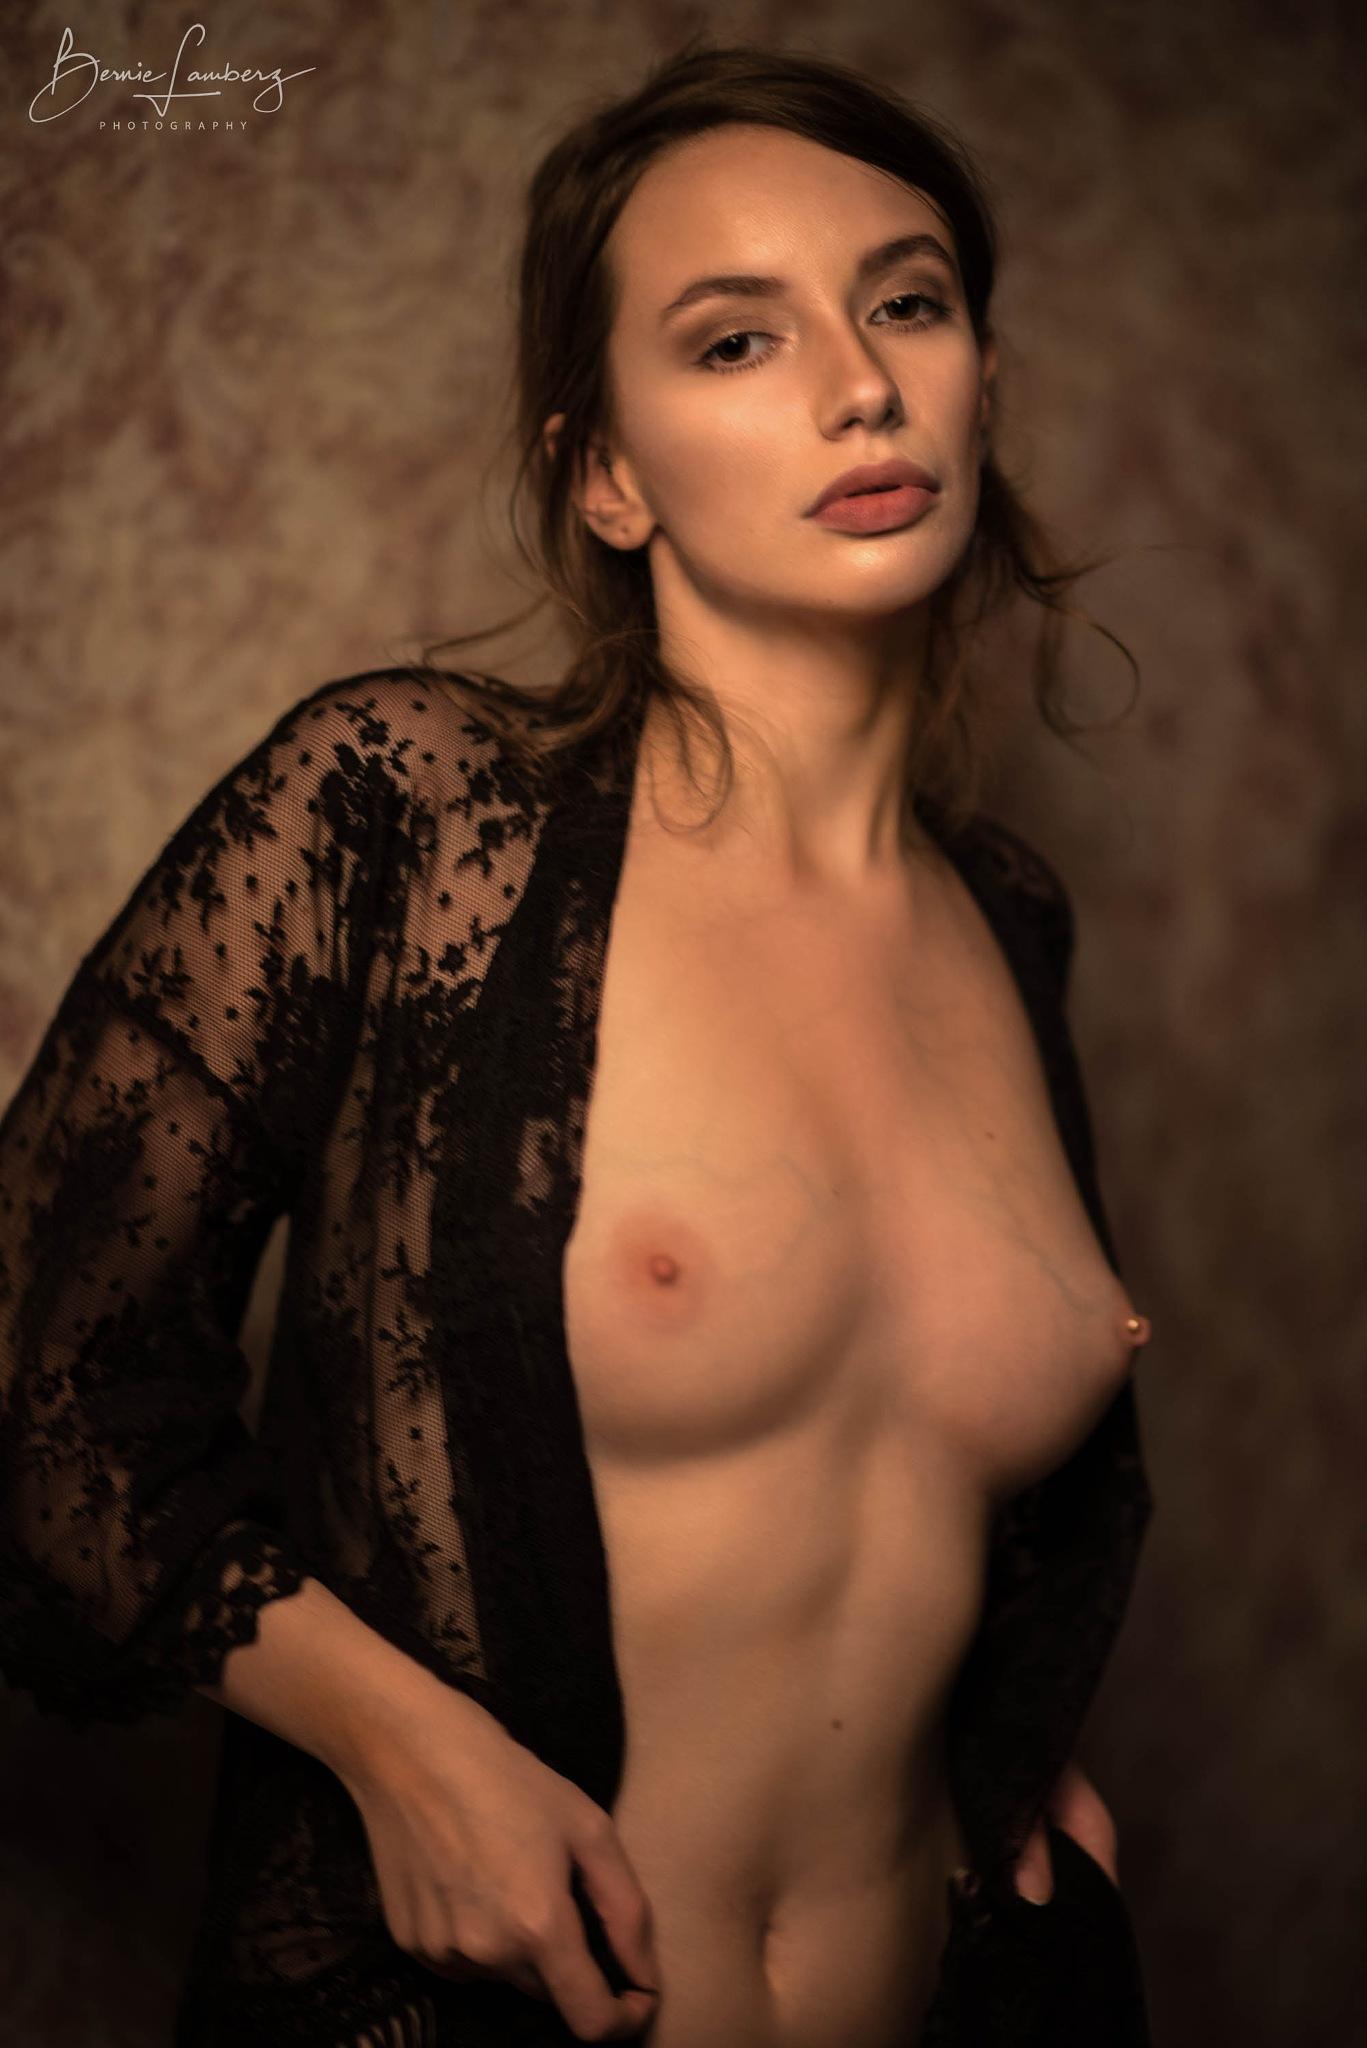 Miss Sorceress by Bernie Lamberz photography